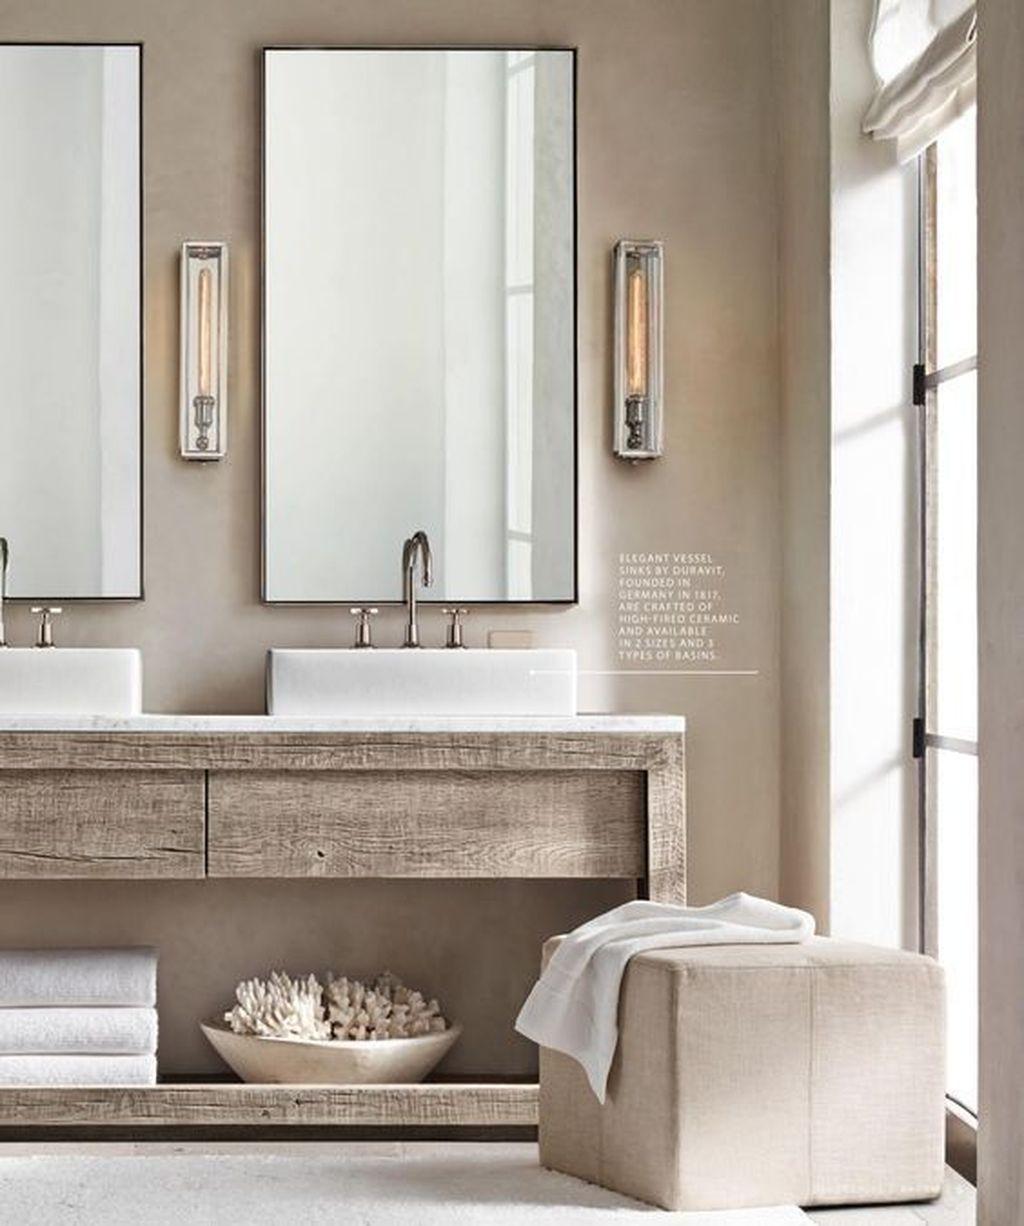 Gorgeous 20 Elegant Mirror Decor Ideas For Bathroom Inexpensive Bathroom Remodel Small Space Bathroom Remodel Bathroom Interior